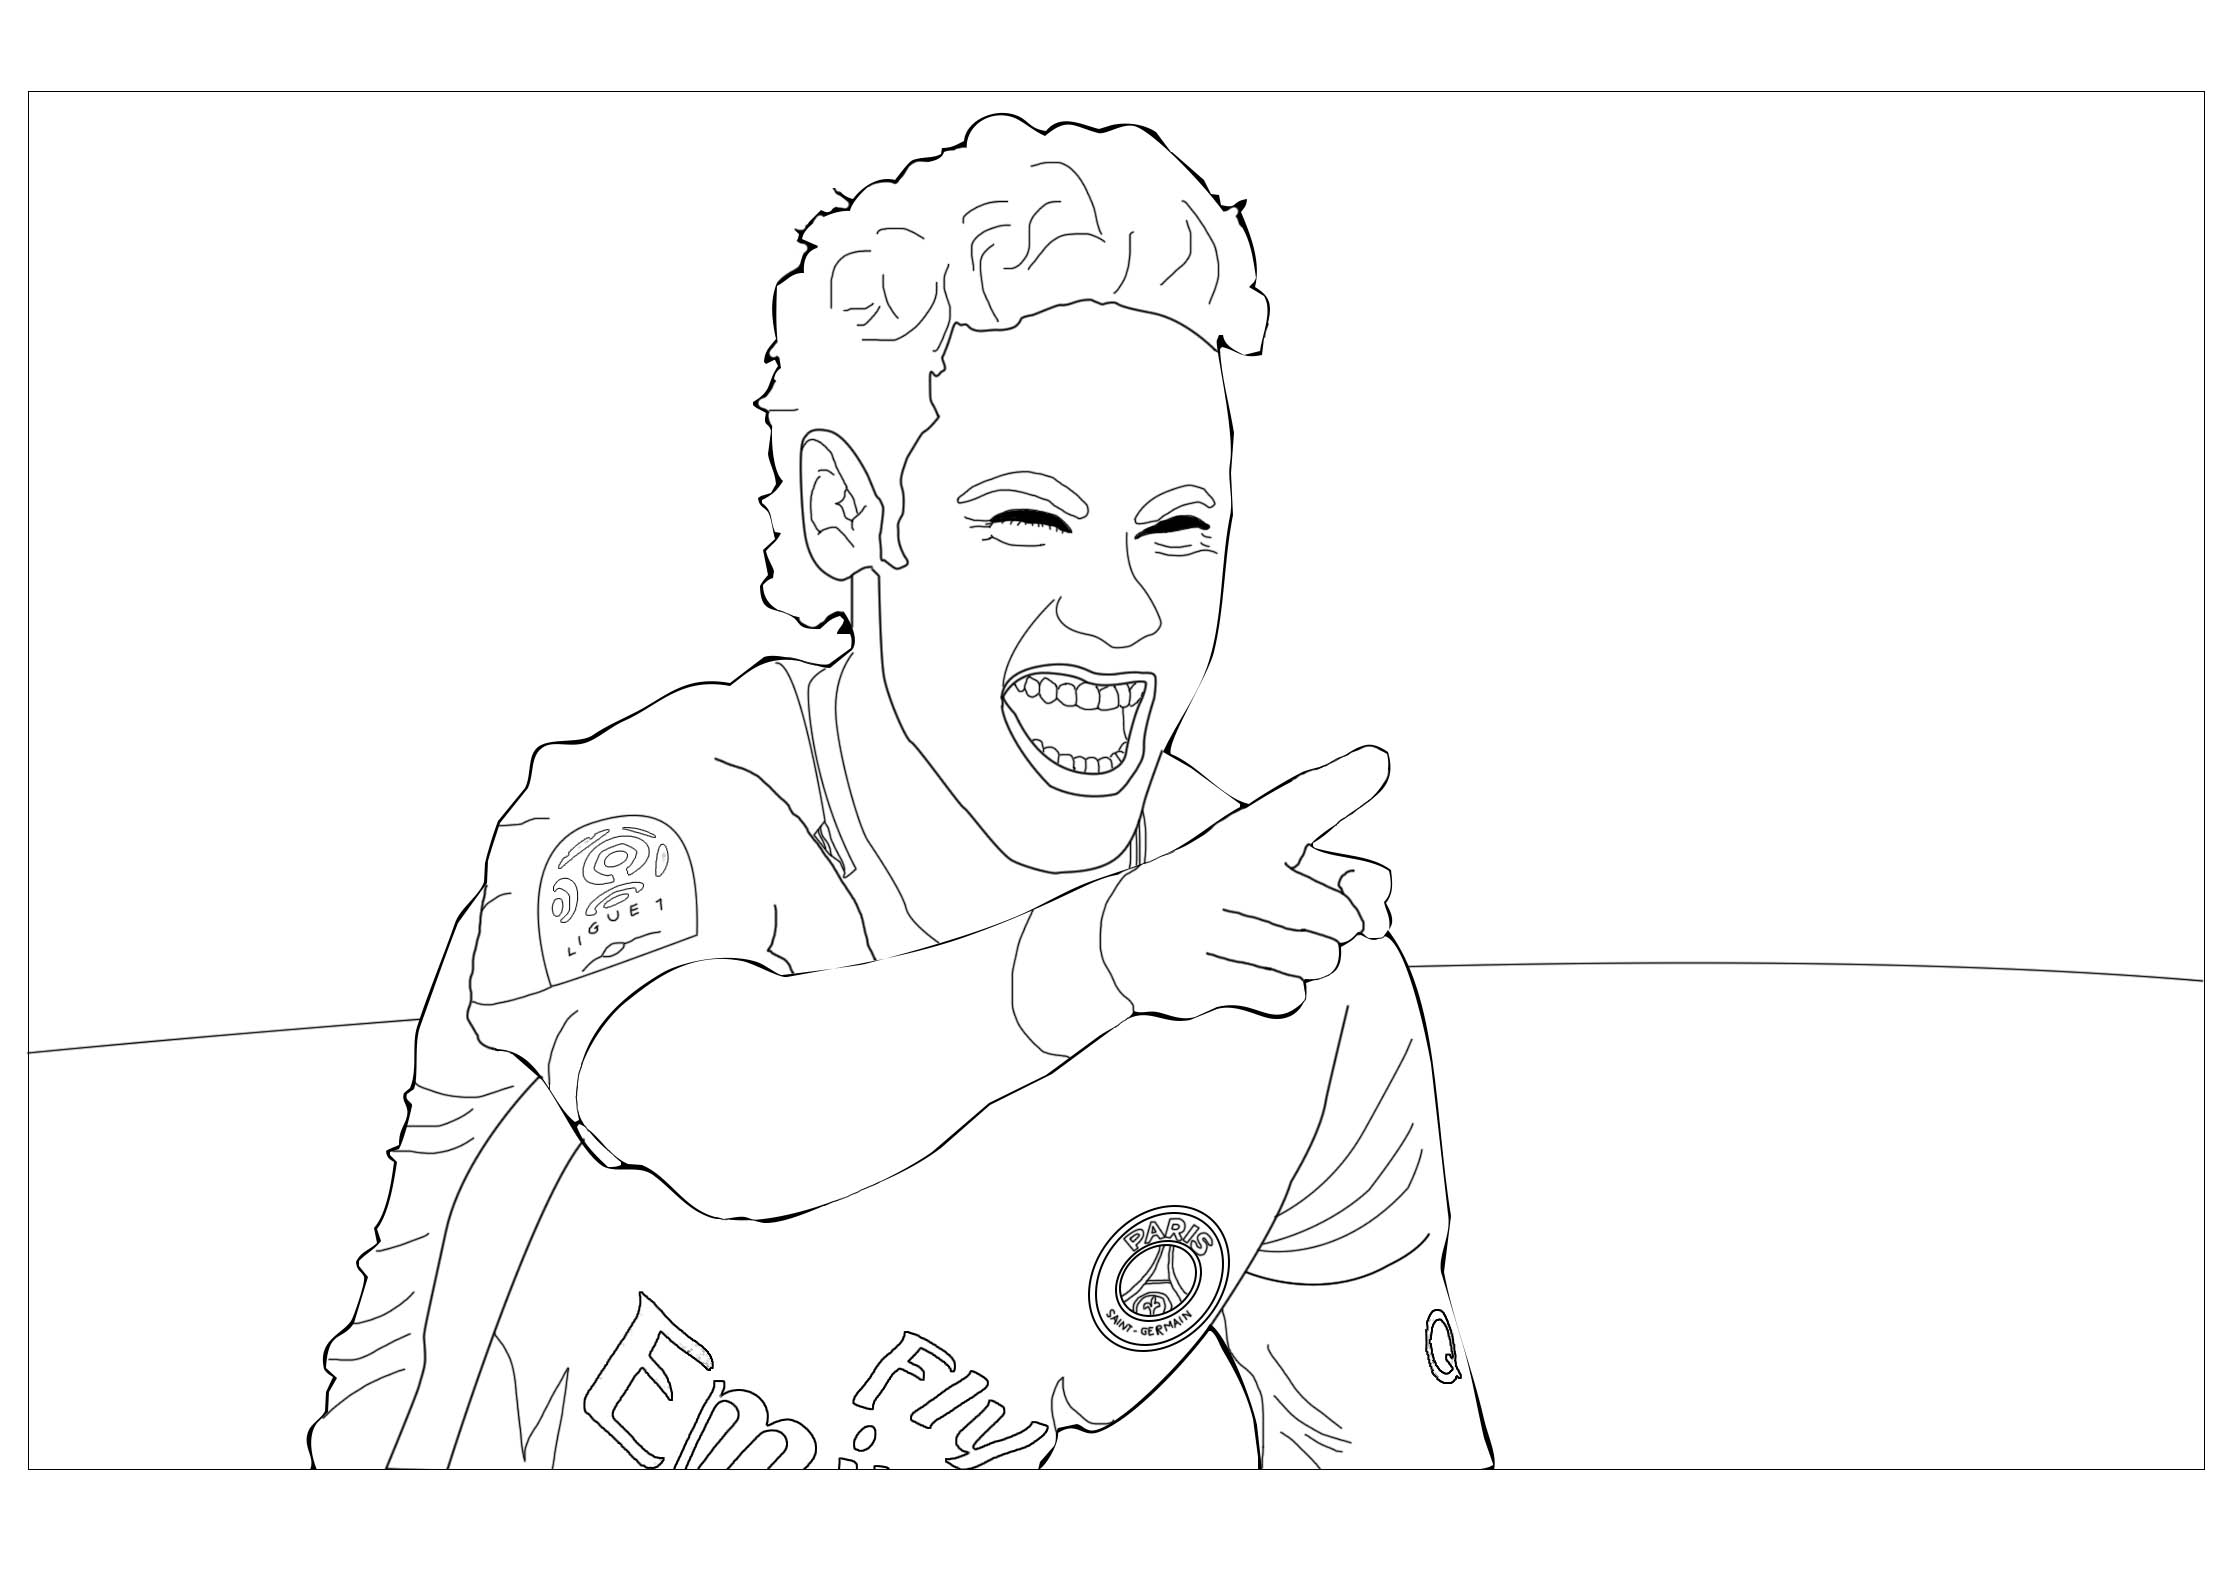 Le célèbre joueur de Football Neymar Jr